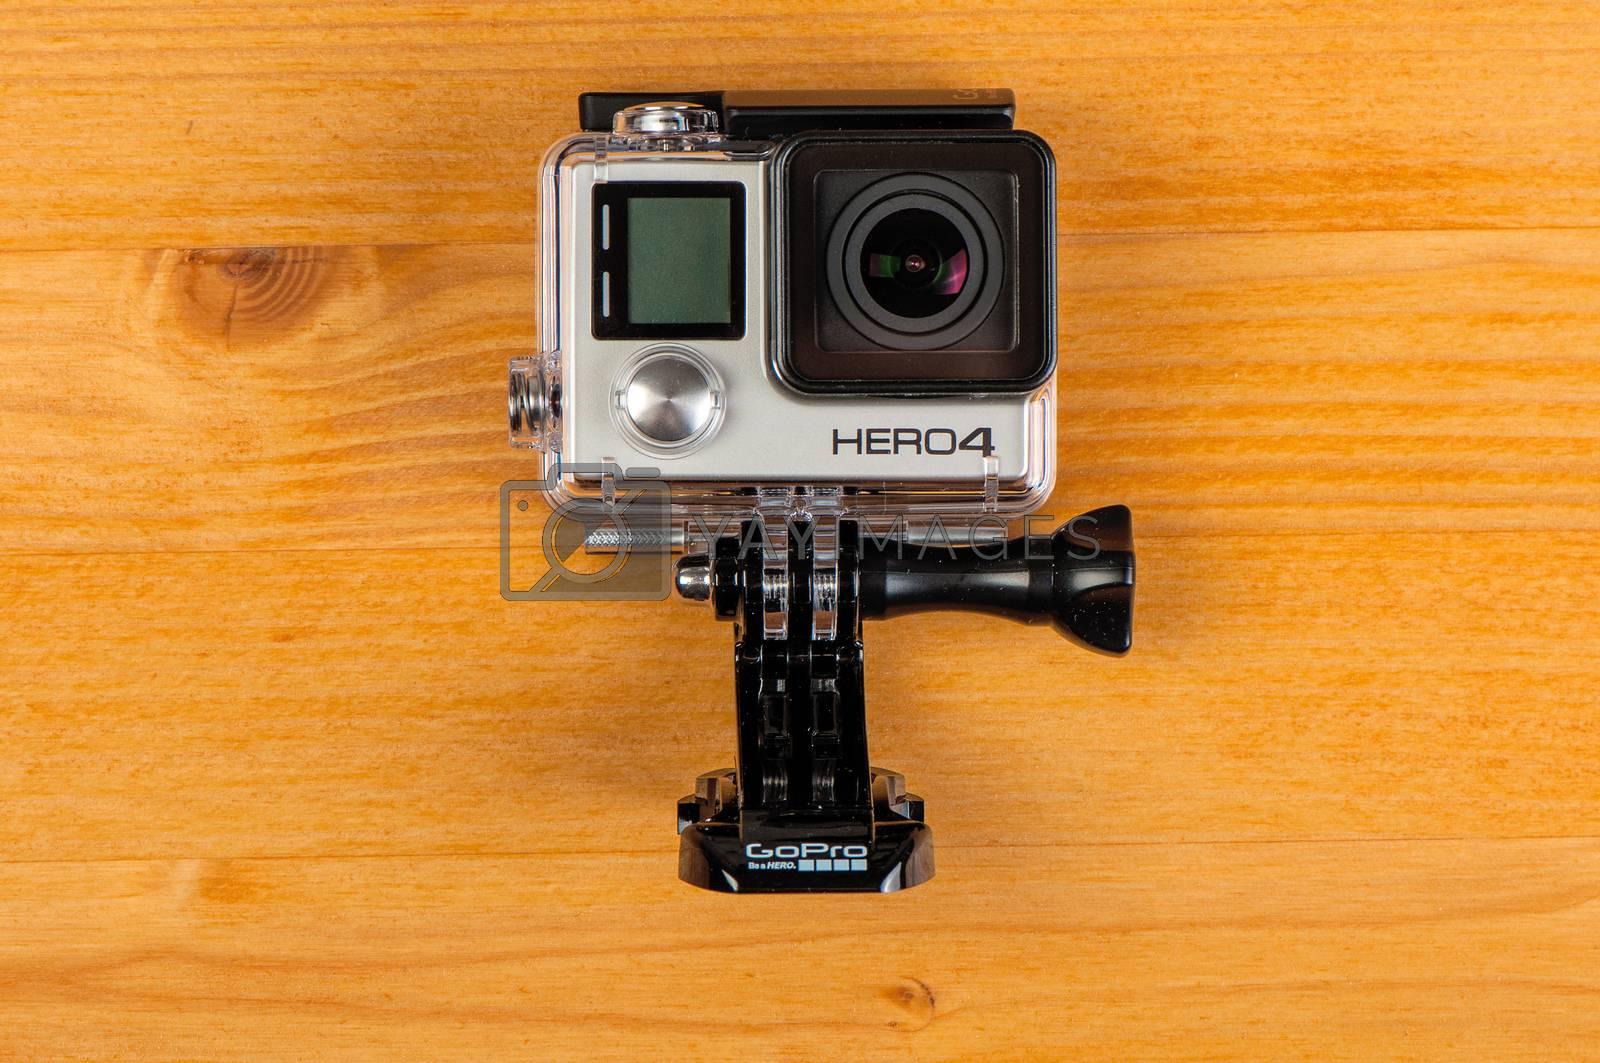 NOVI SAD, SERBIA - JUNE 19, 2016: GoPro Hero 4 Black waterproof action camera announced in september 2014 captures full hd video in up to 120 frames per second, illustrative editorial